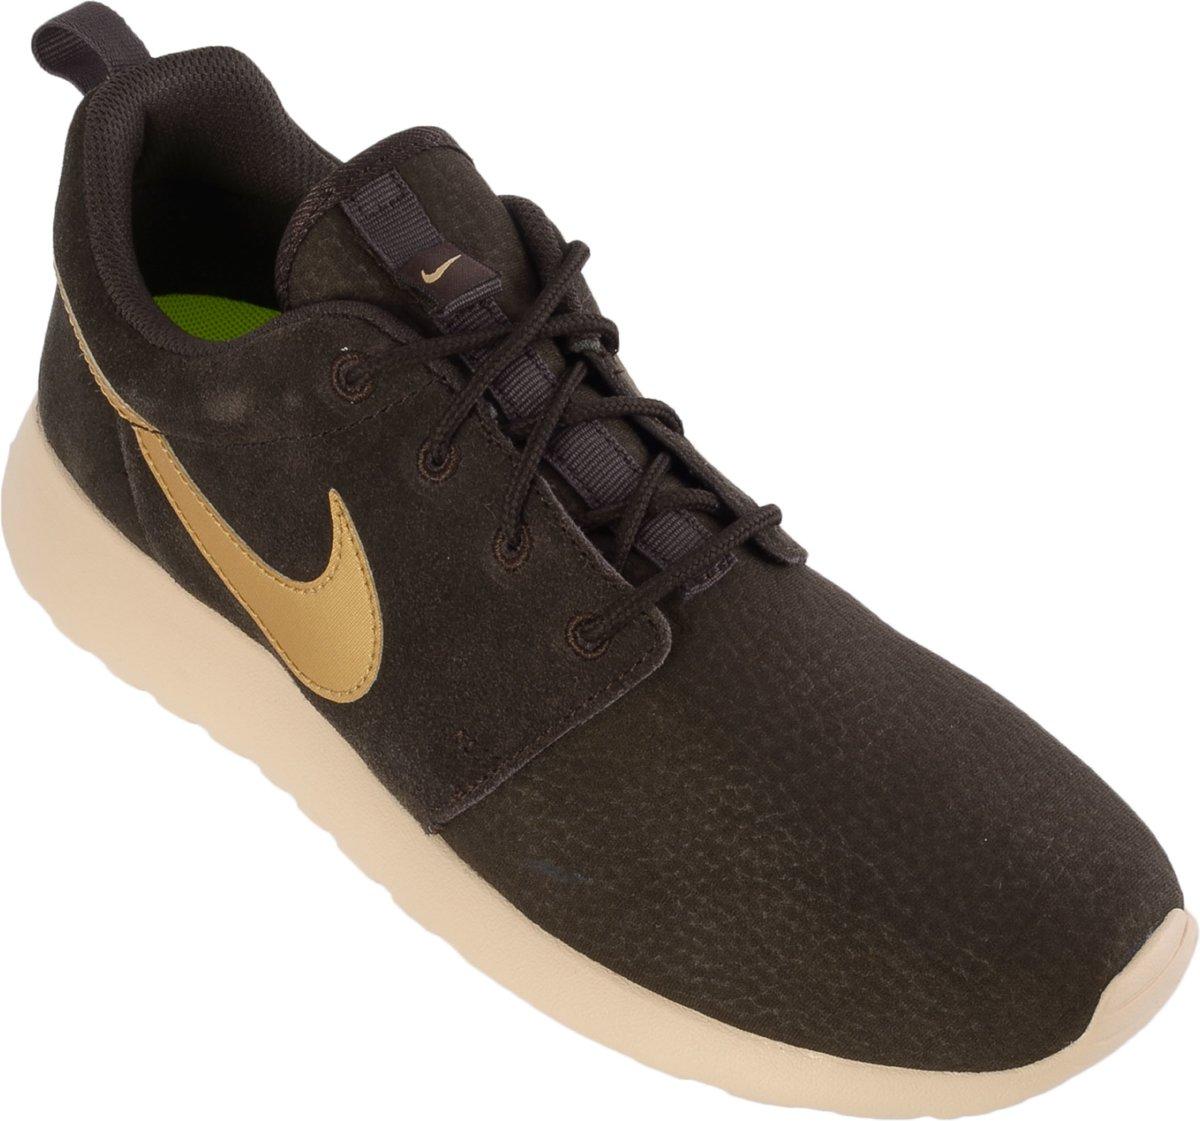 official photos e74b2 f5c15 bol.com  Nike Rosherun - Sneakers - Mannen - Maat 44 - Bruin